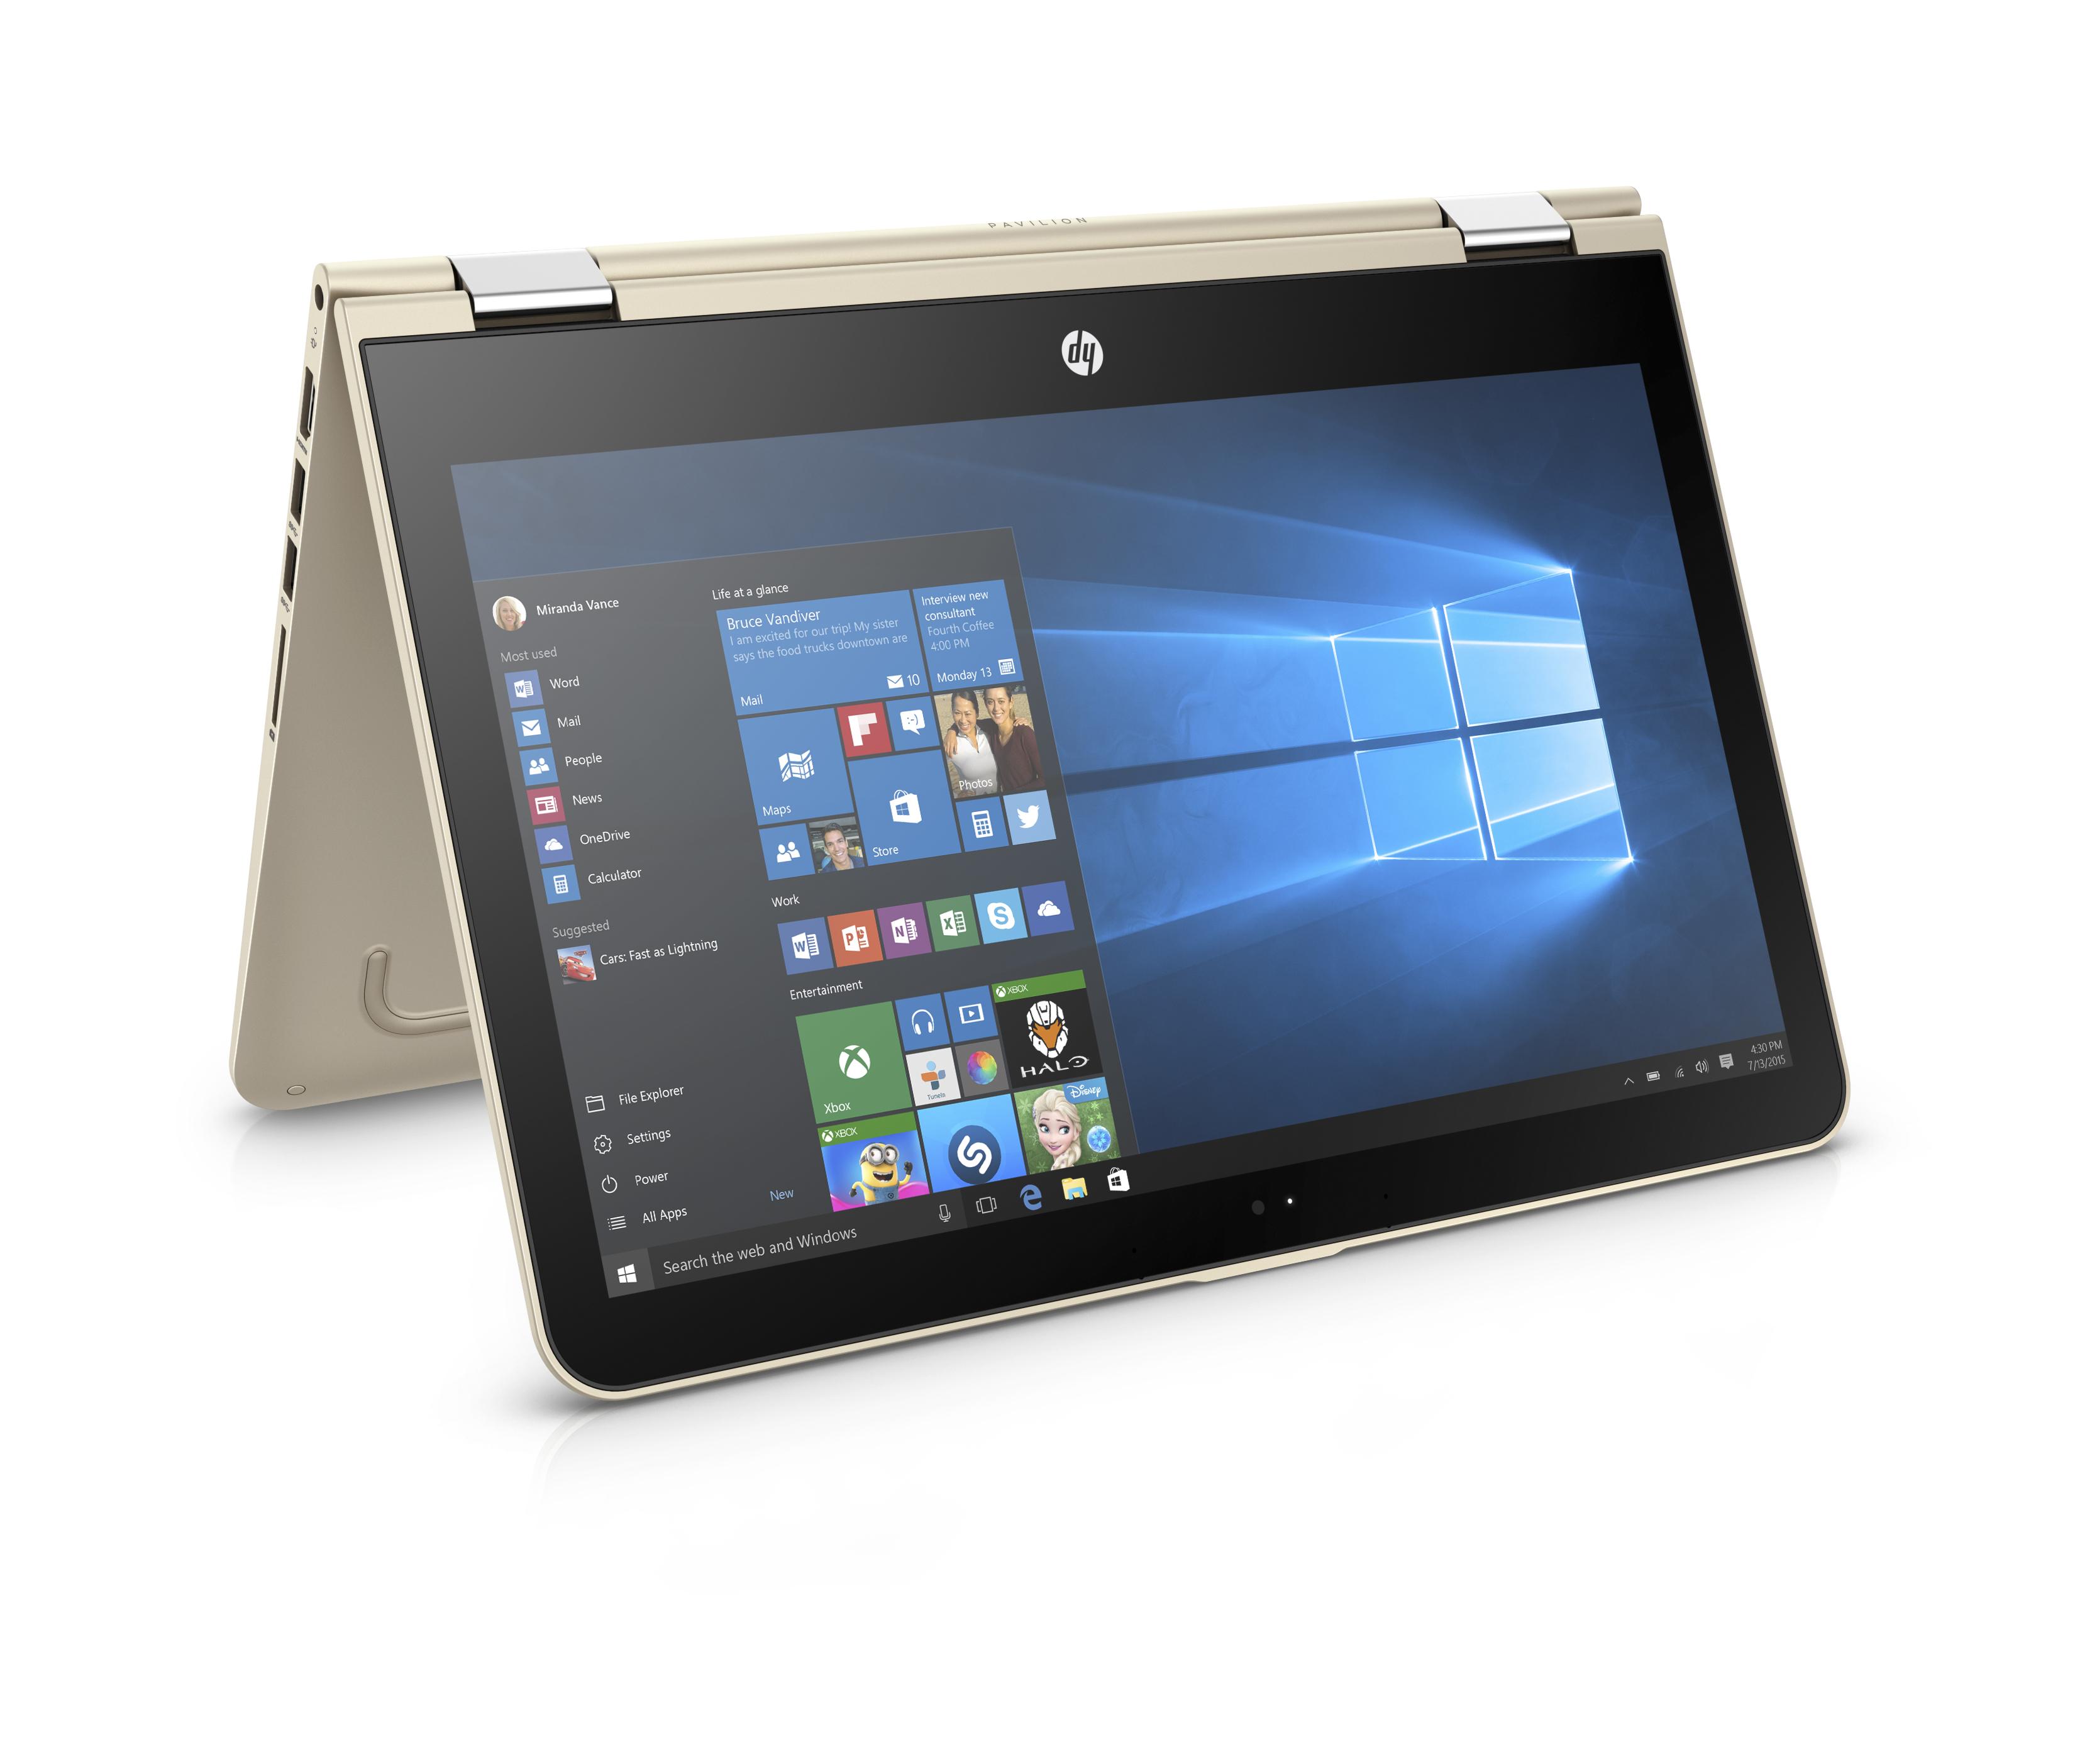 HP Pavilion x360 13-u003nc FHD i5-6200U/8GB/500GB+8GB/2RServis/W10-gold